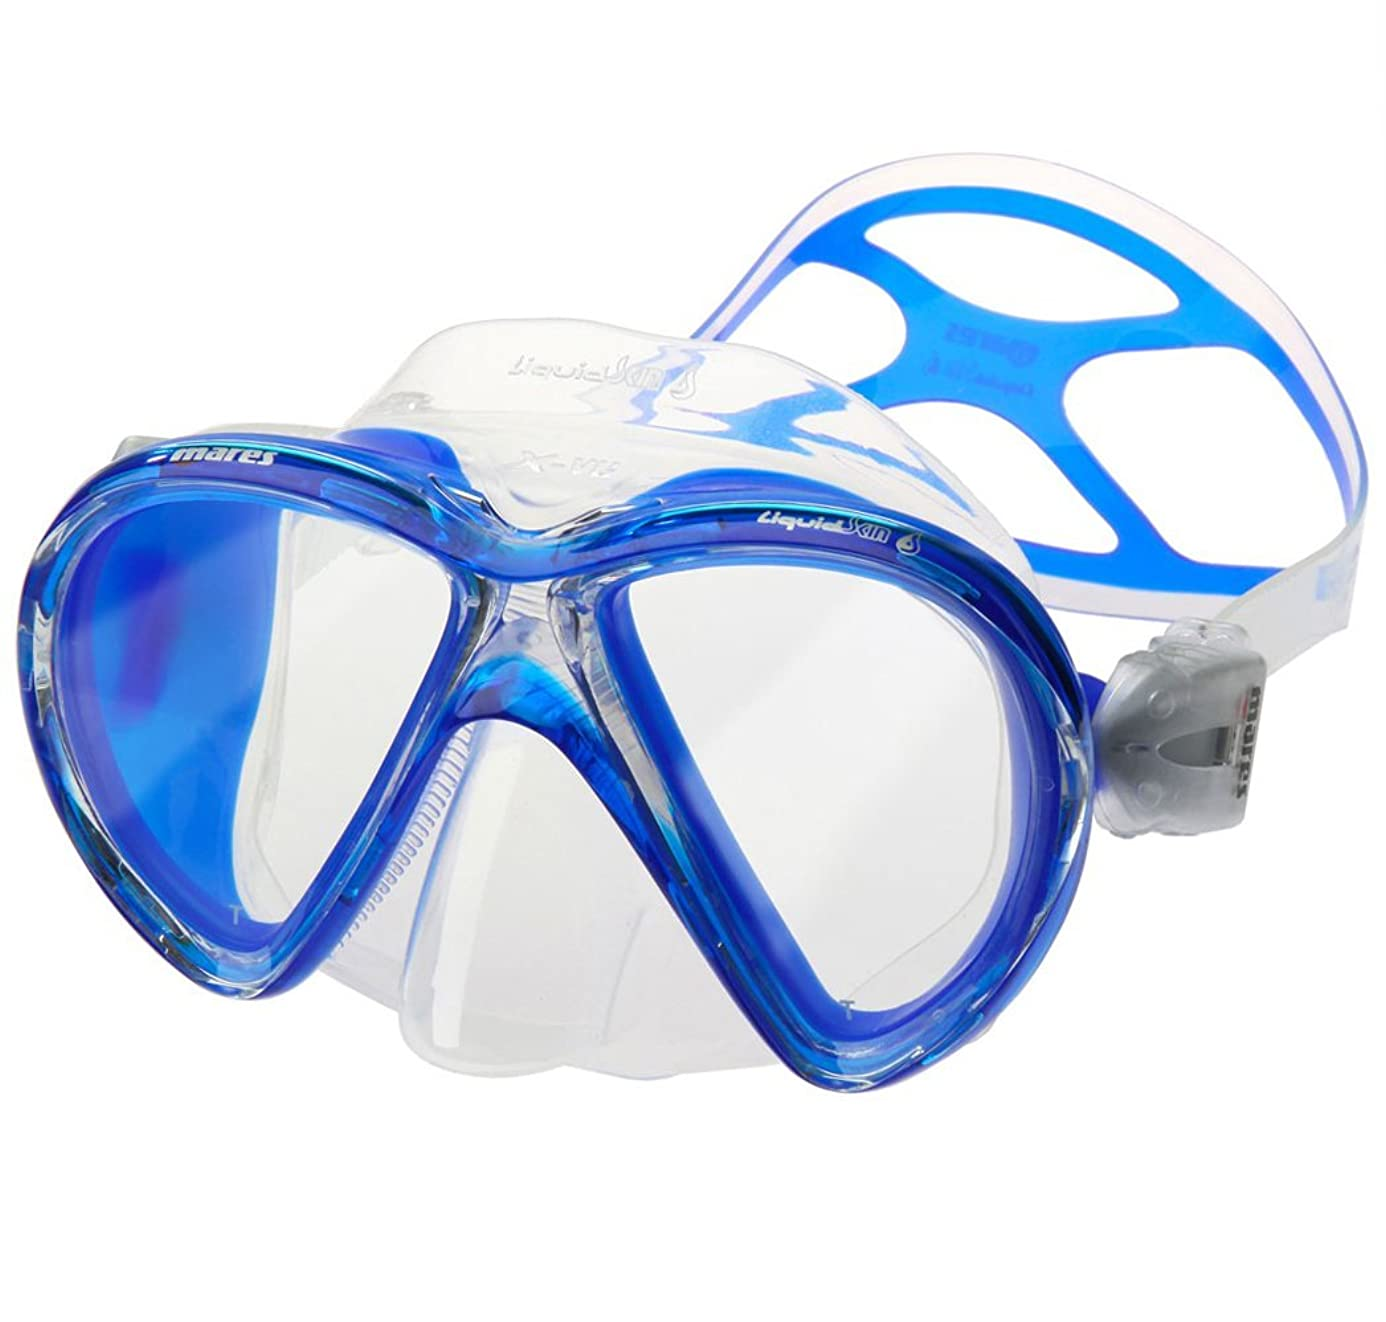 Mares X-VU Liquidskin 2 Window Scuba Diving Mask